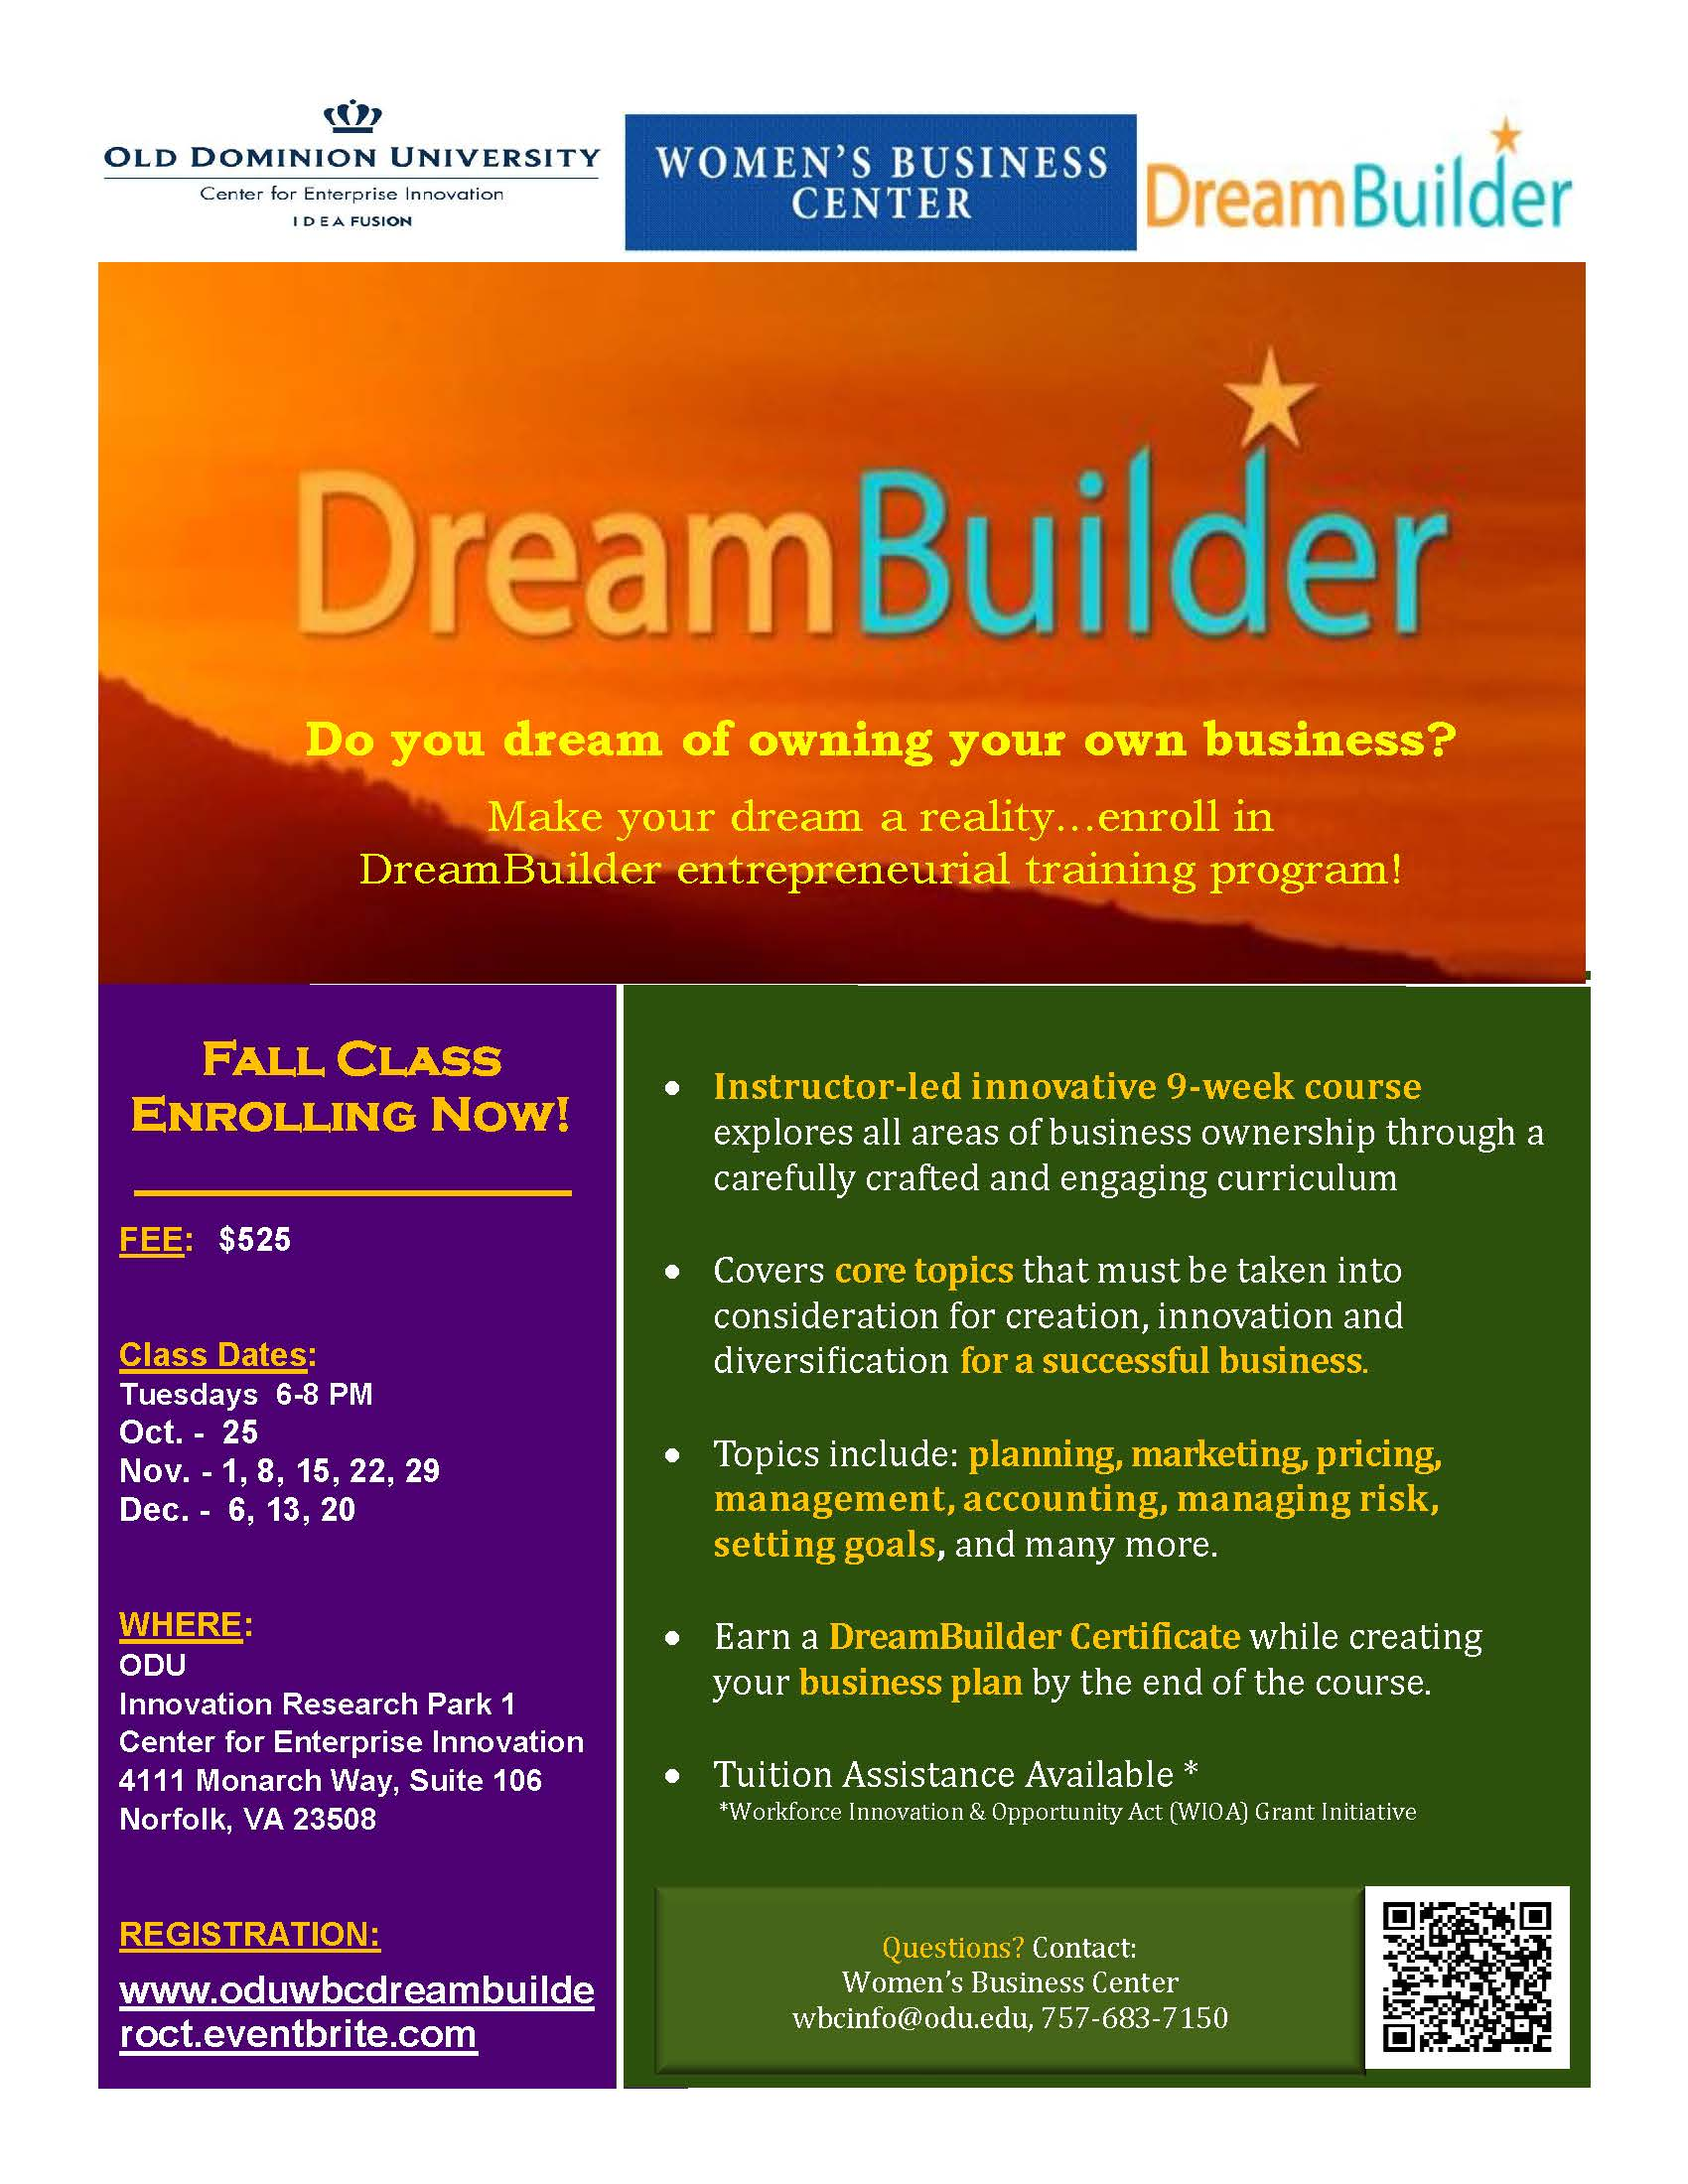 Dream Buider Flyer